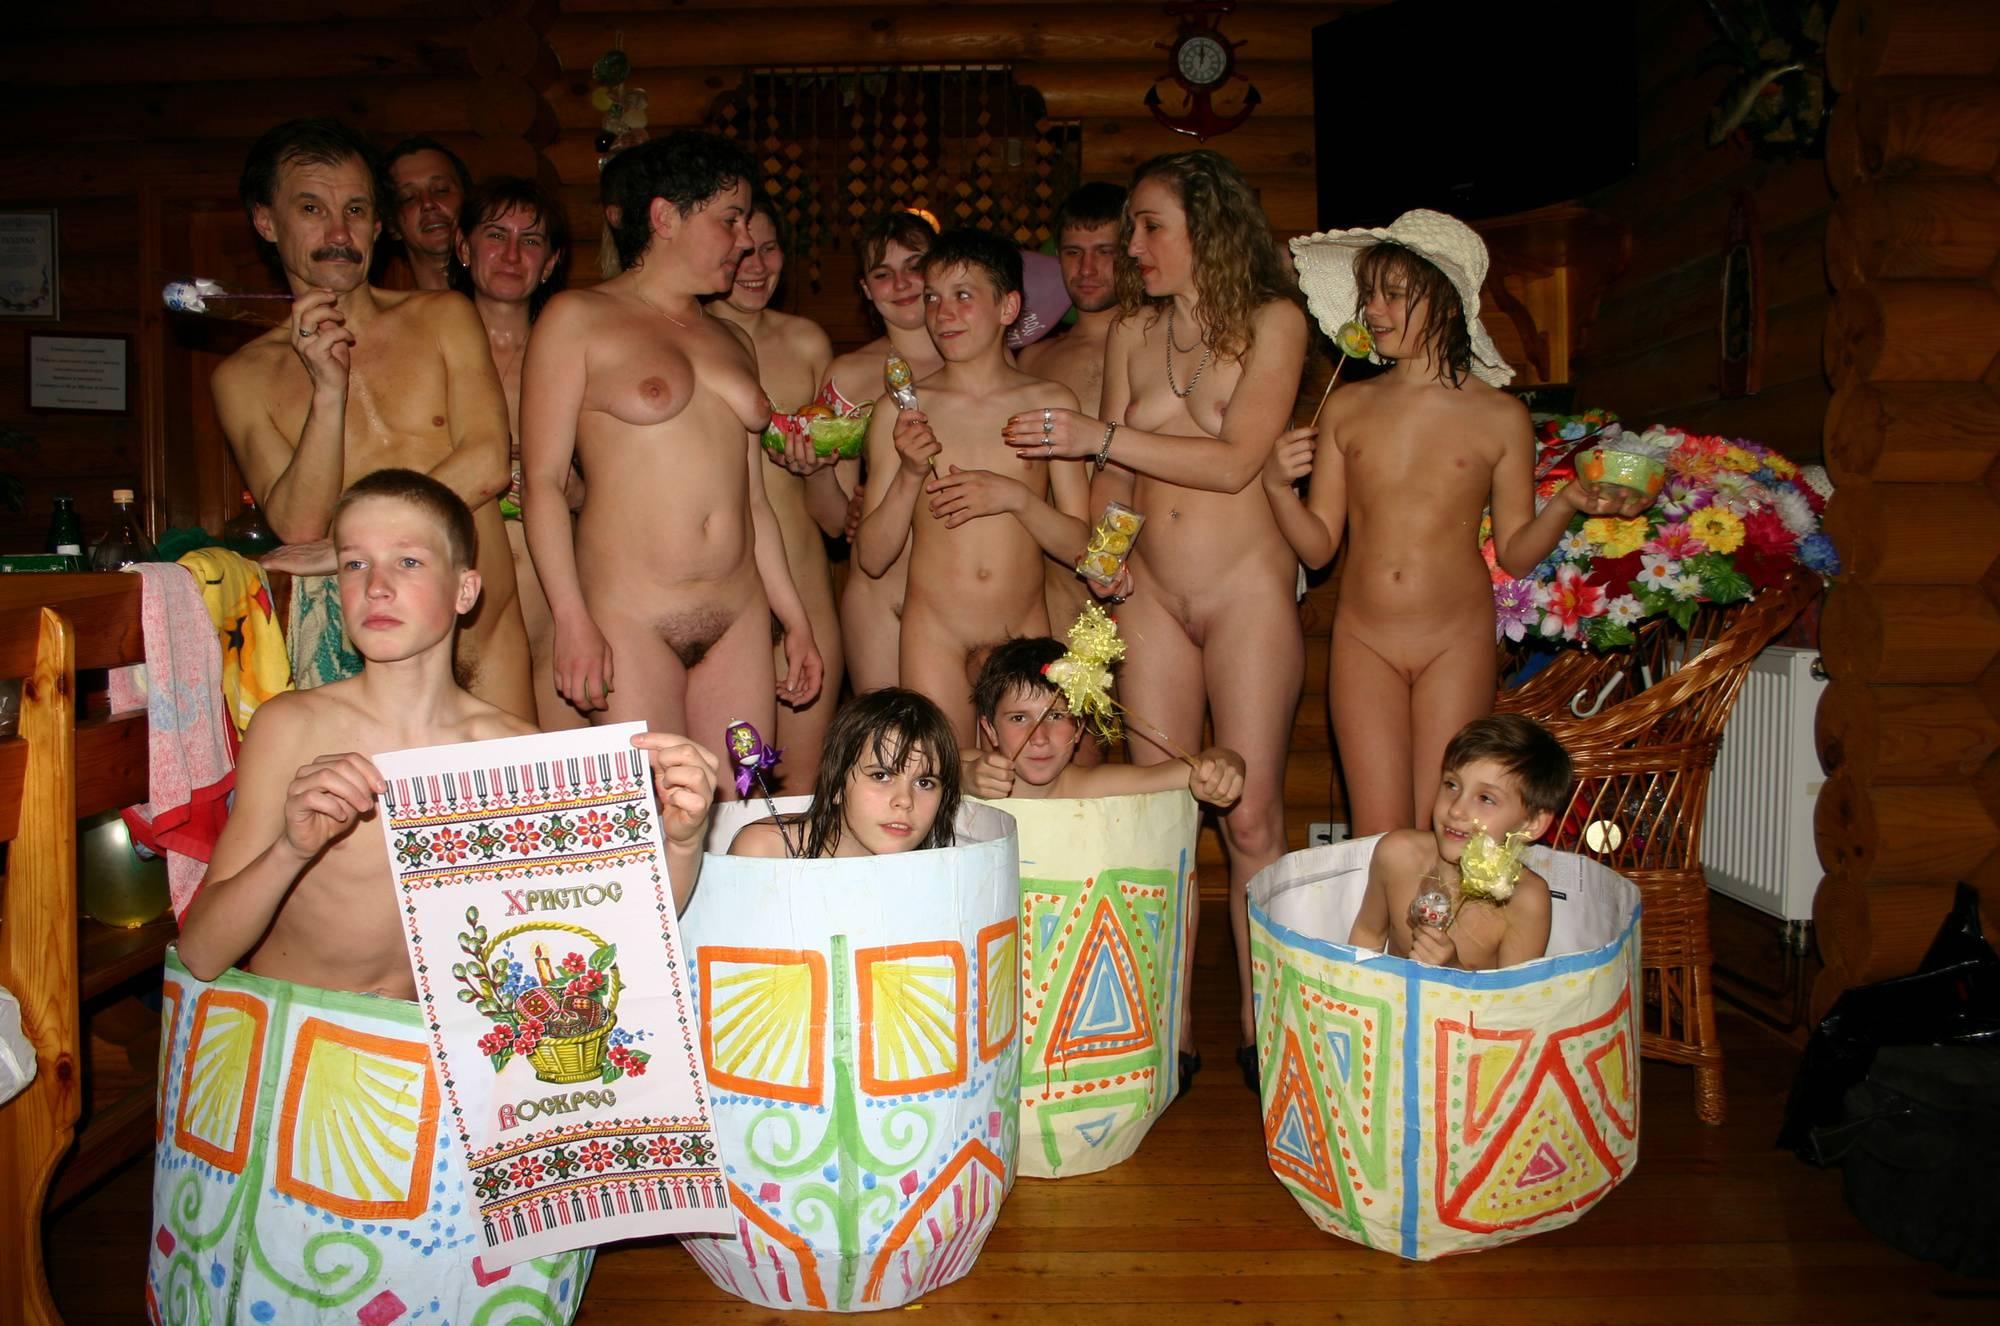 Nudist Pictures Easter Group Memories - 2